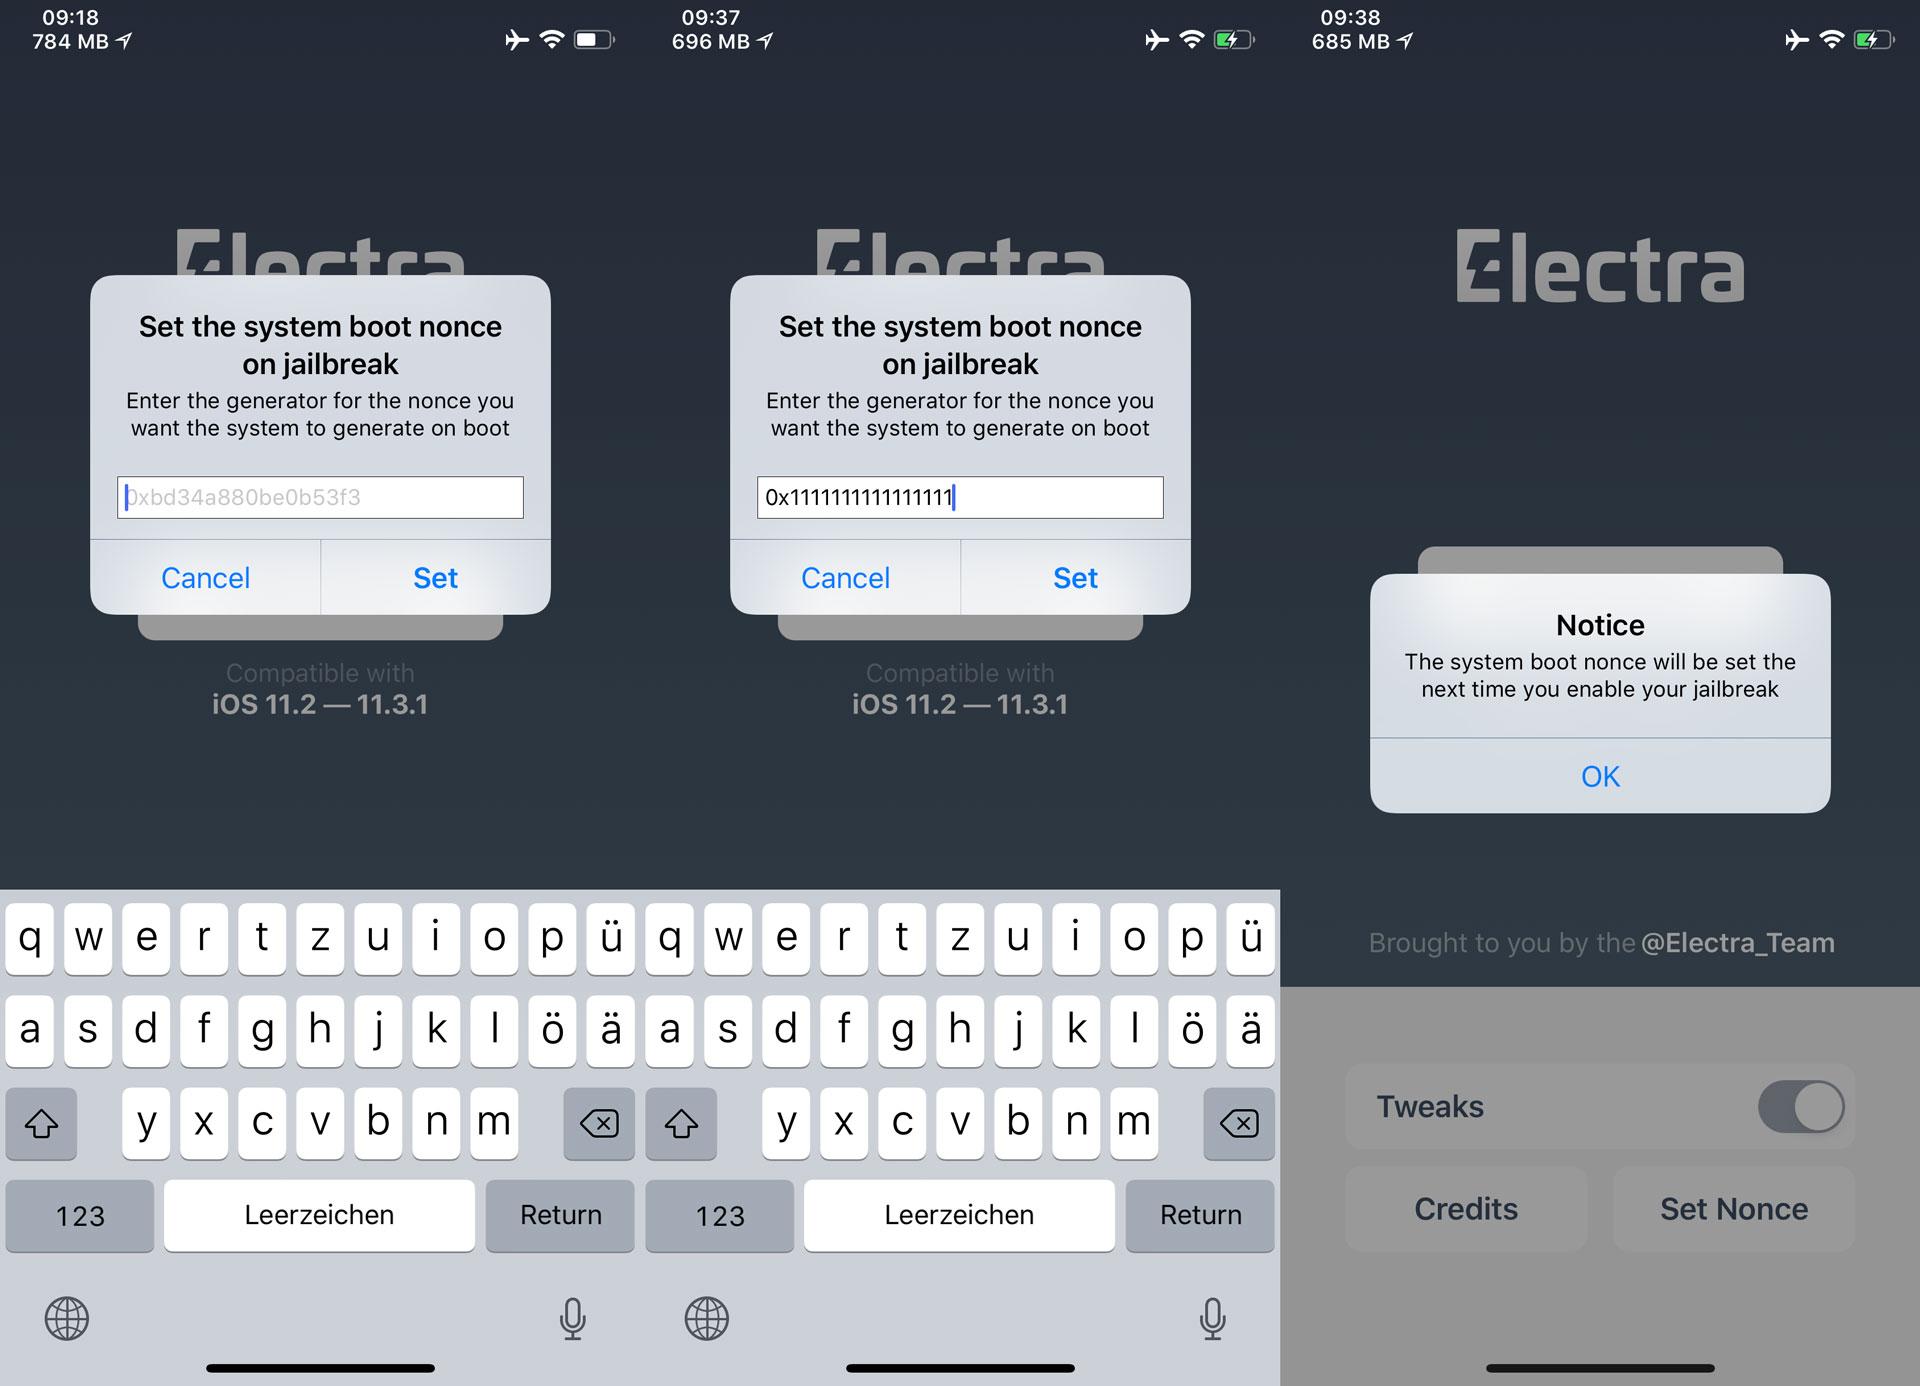 boot nonce unter iOS 11.x mit electra Jailbreak setzen, Hack4Life, Fabian Geissler, FutureRestore, TSSSaver, Anleitung, Tutorial, iOS 12, iOS 11, unc0ver, Electra